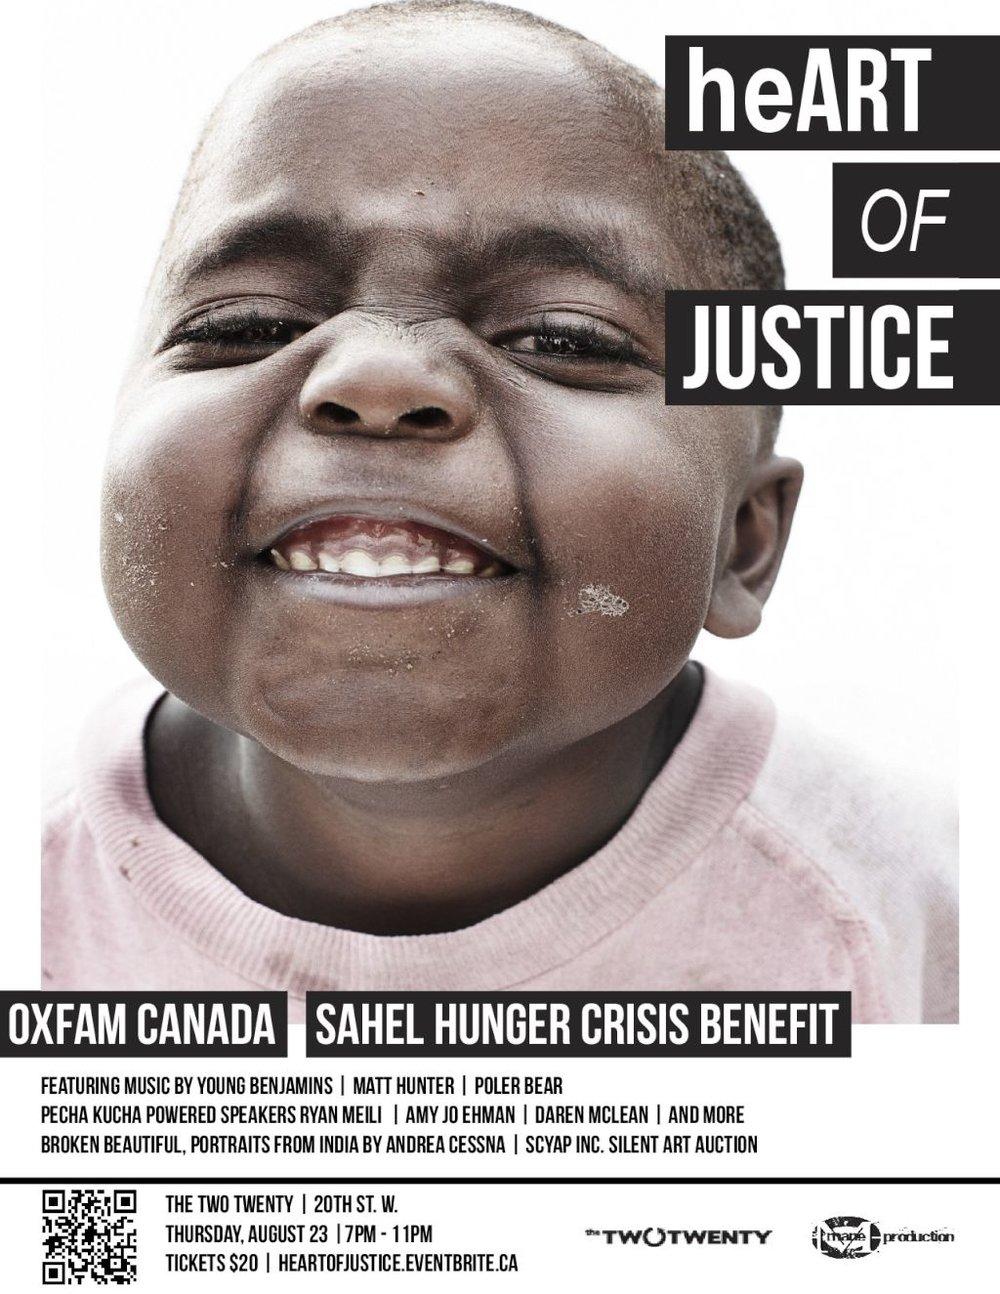 oxfam aug 23.jpg